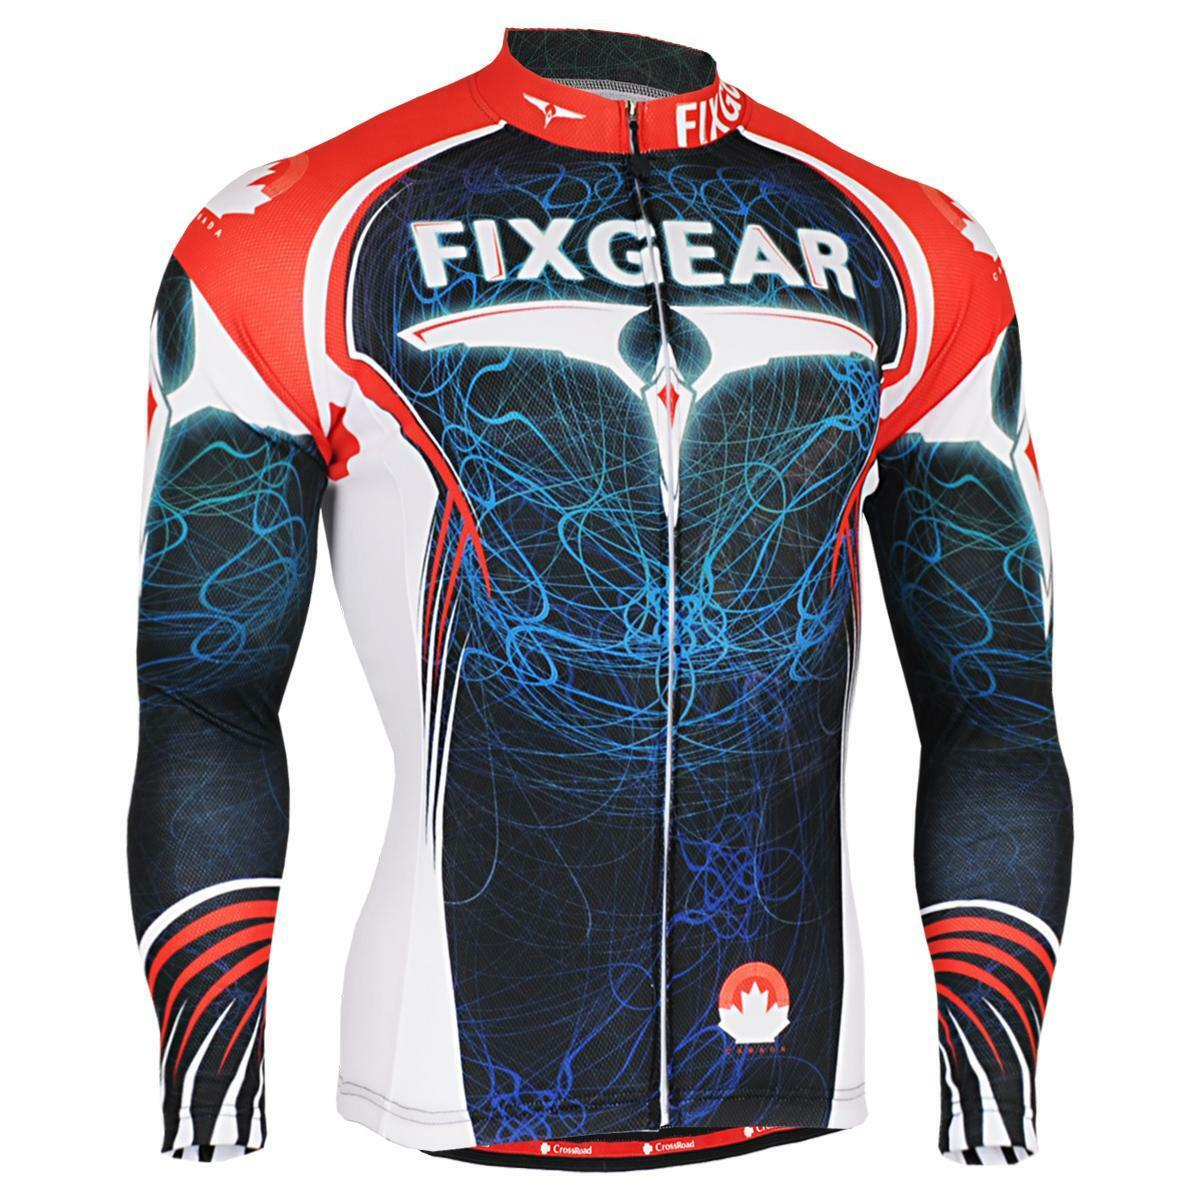 Fixgear cs-3501 Para Hombre  Manga Larga De Ciclismo Bicicleta Apparel roadbike Mtb  autorización oficial